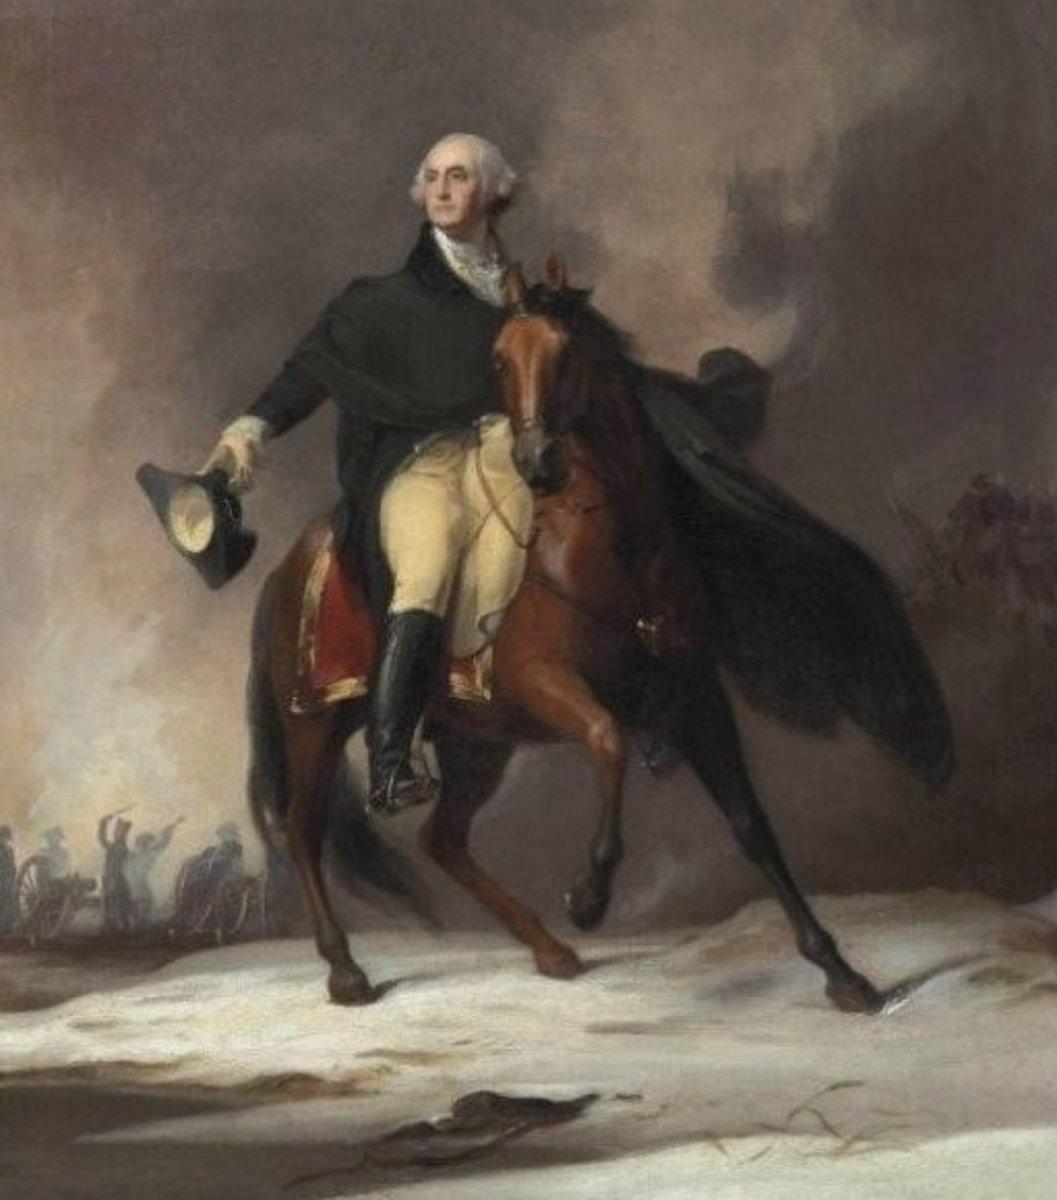 General George Washington